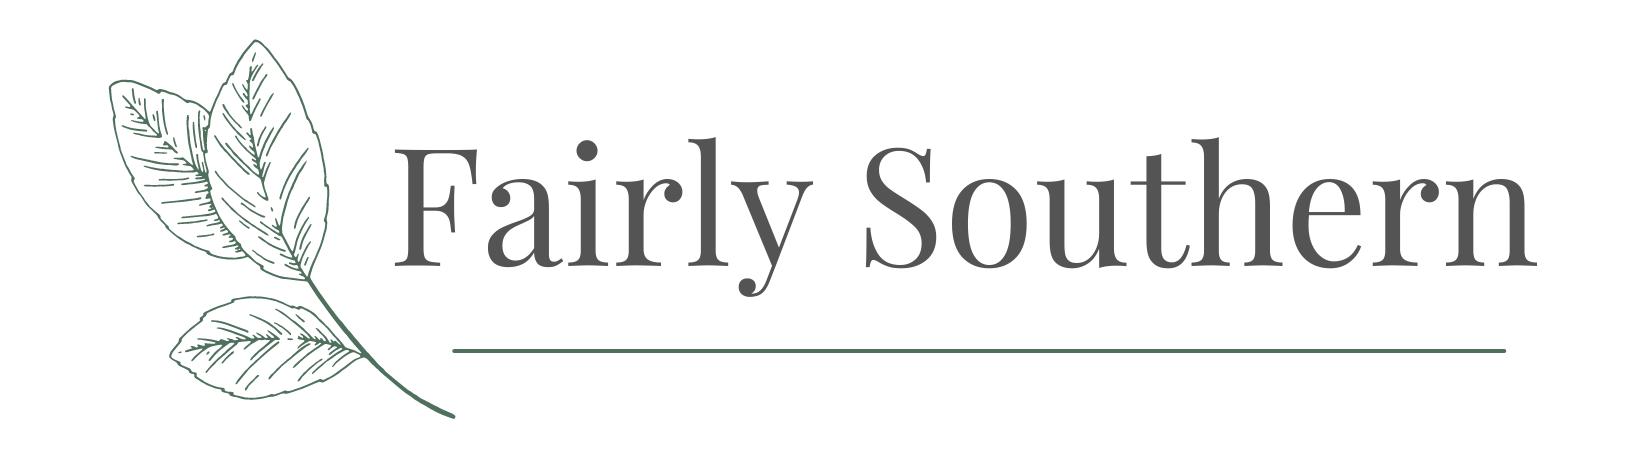 Fairly Southern logo